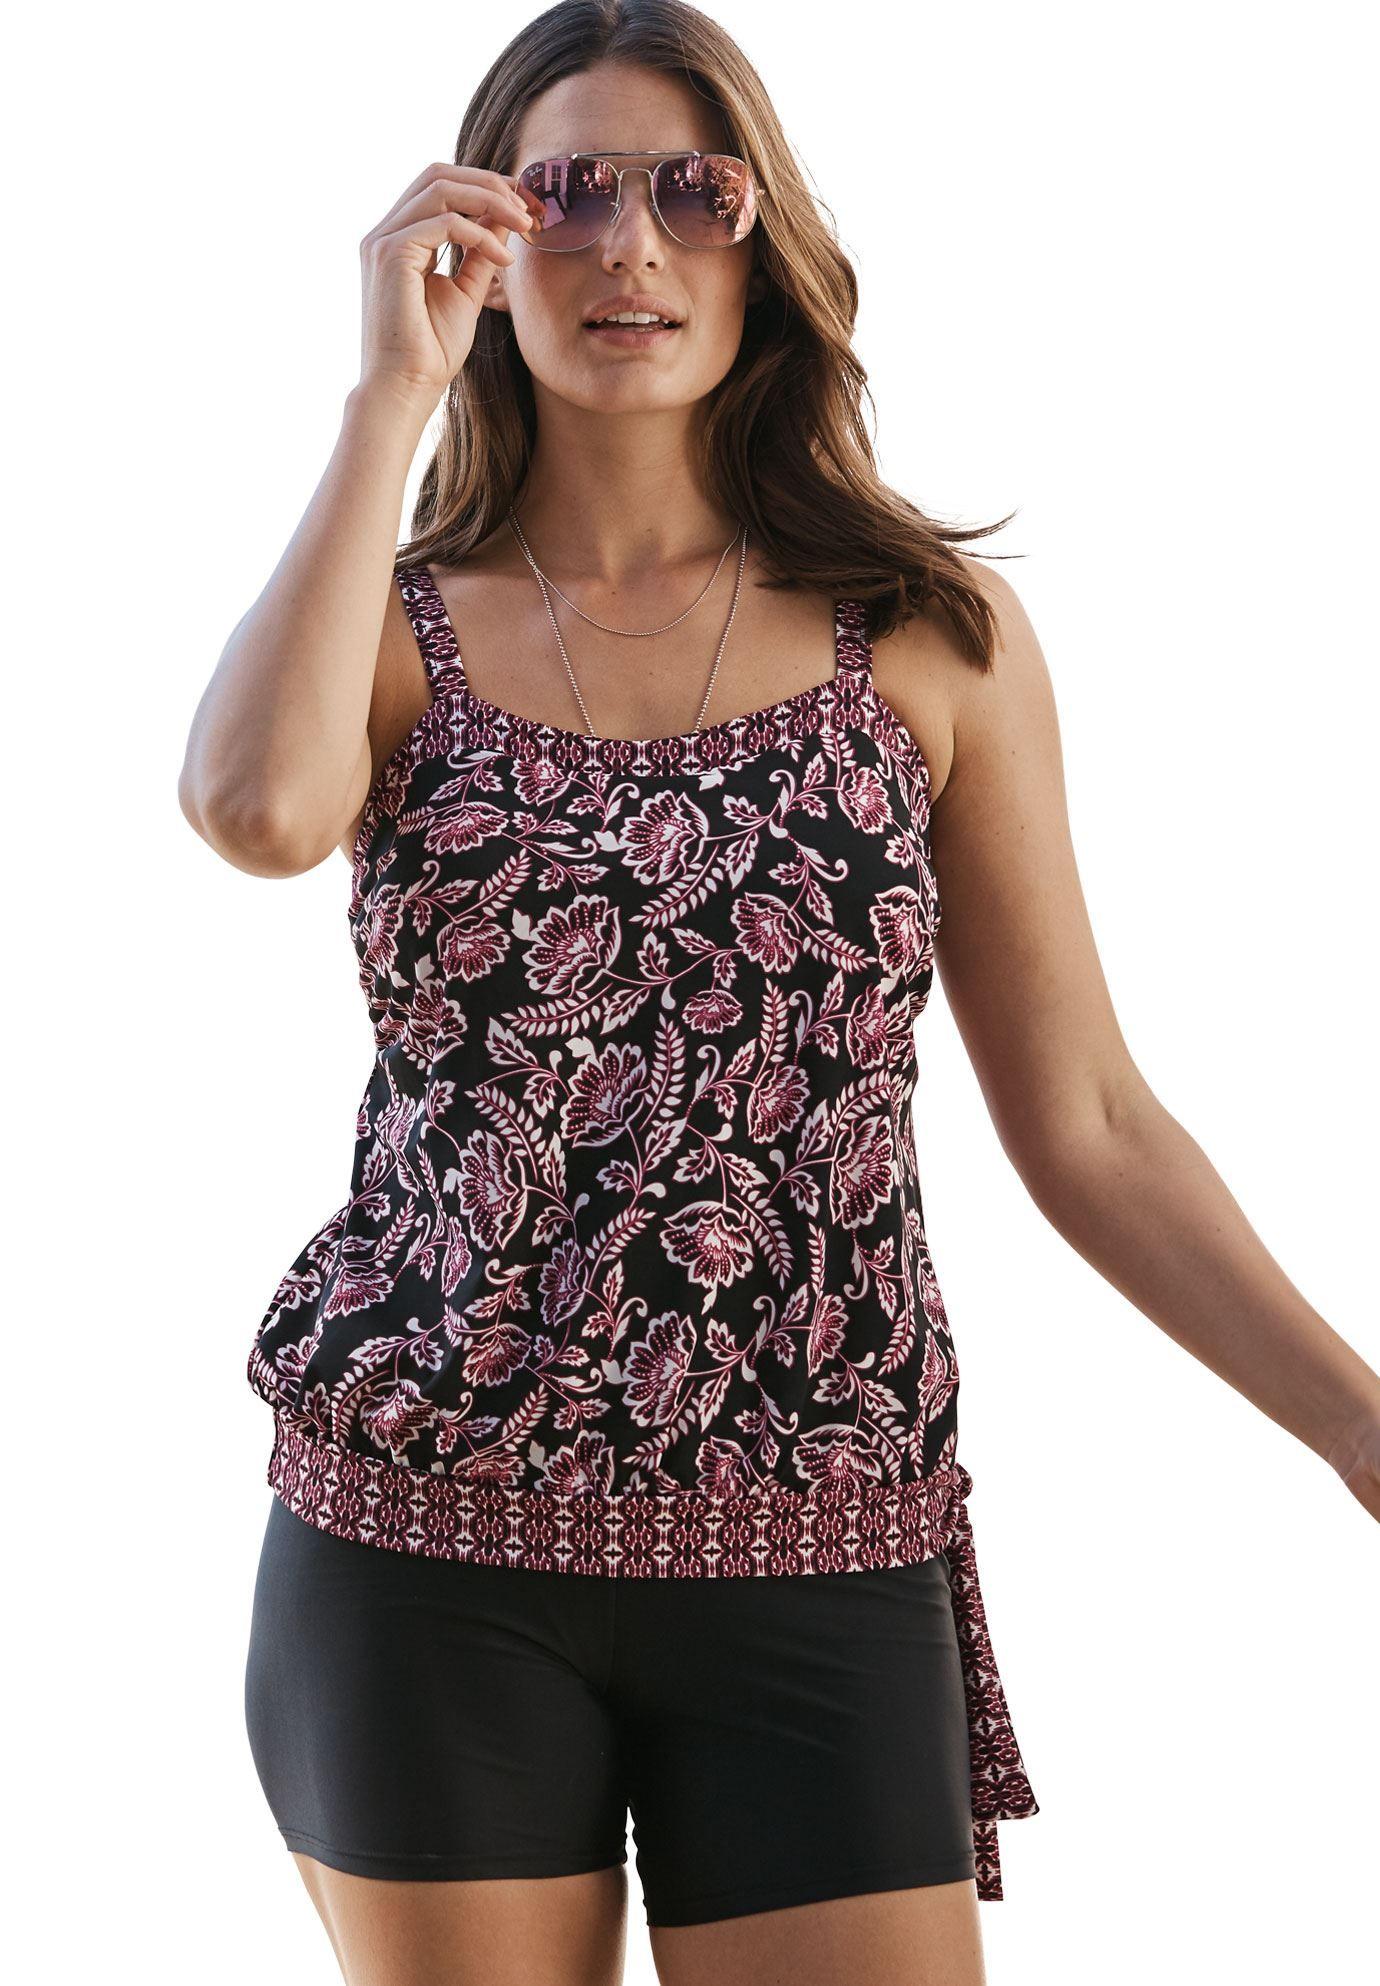 bc8dfea0786 Side-tie tankini top with blouson by Swim 365 - Women's Plus Size Clothing